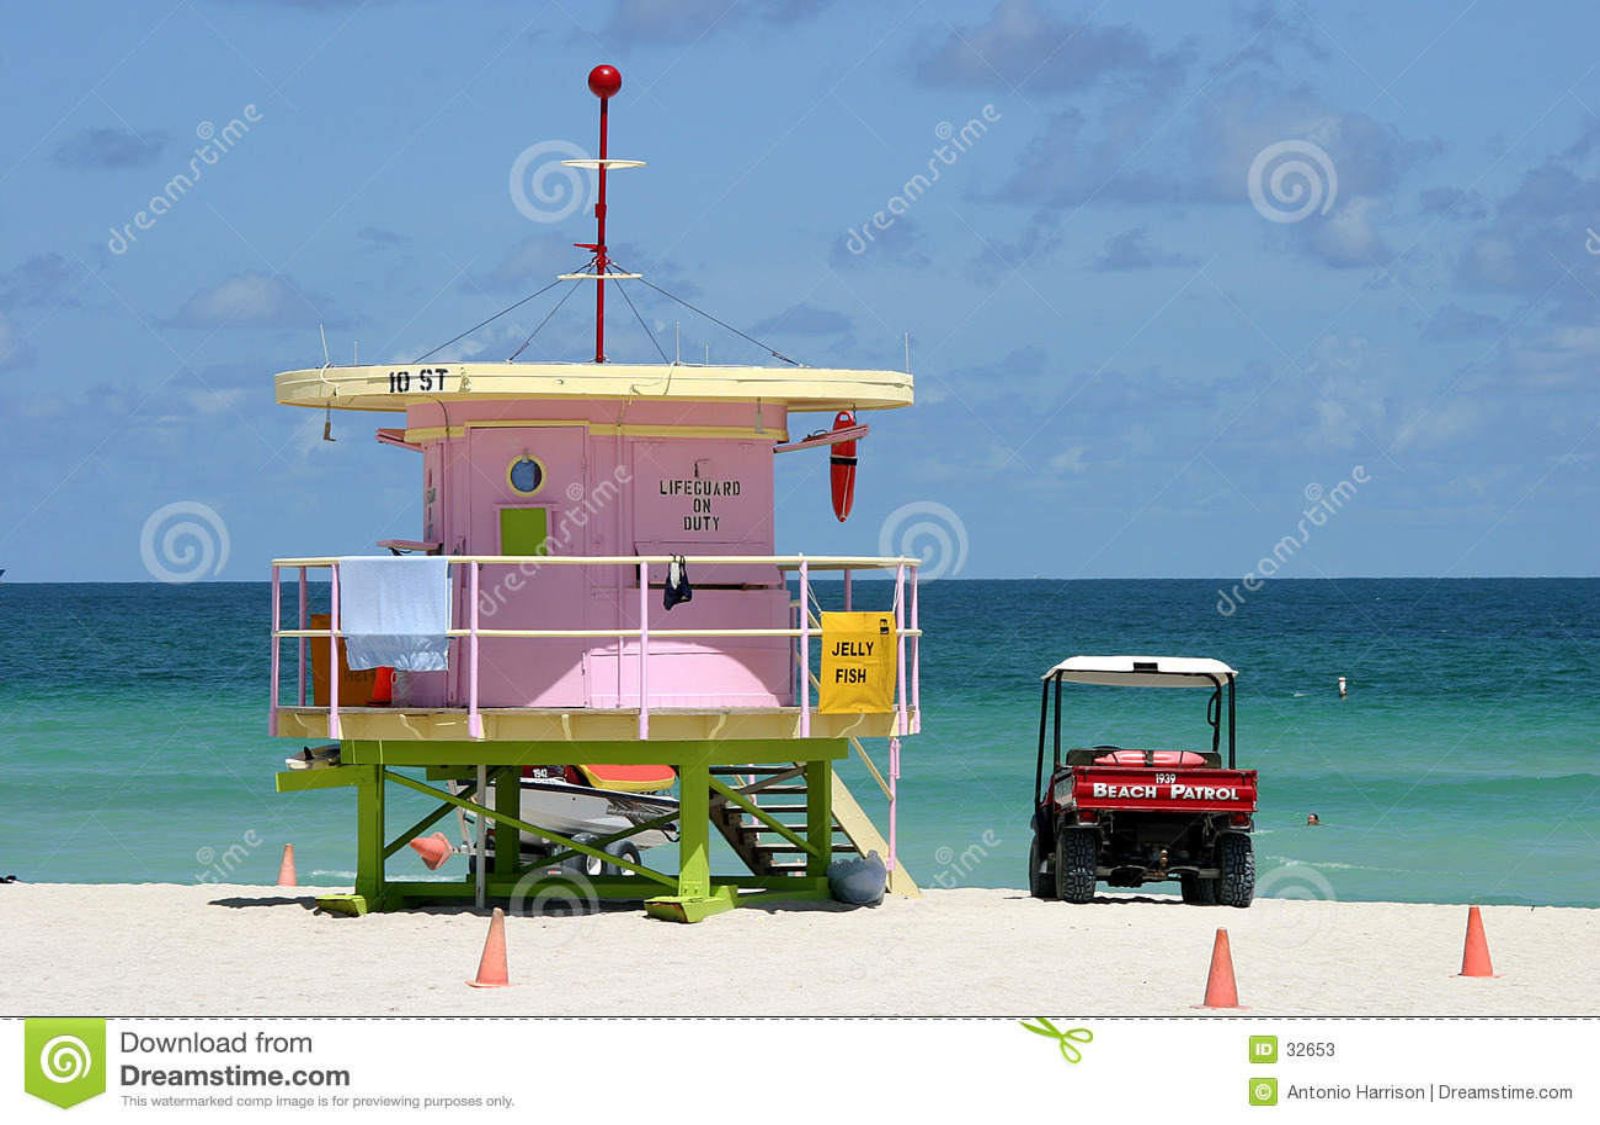 south Beach patrol